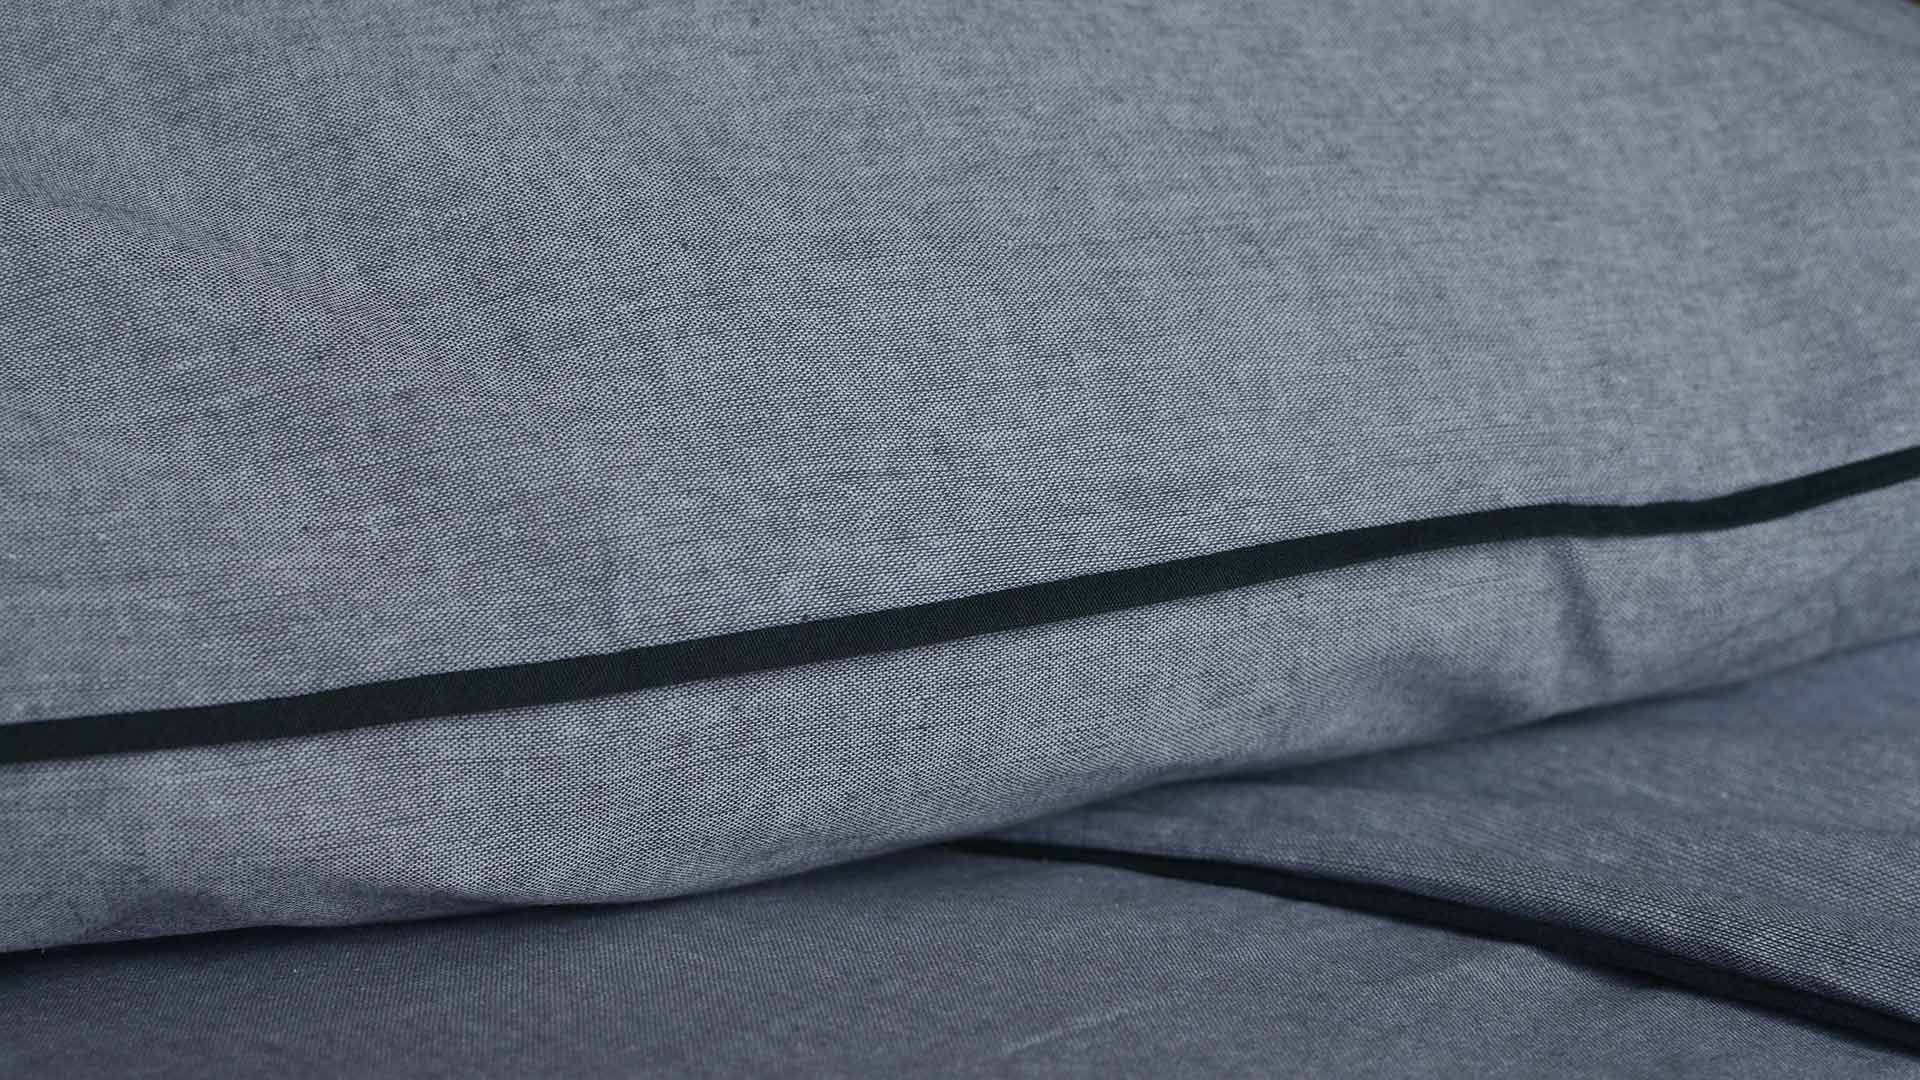 chambray-bedding-grey-detail